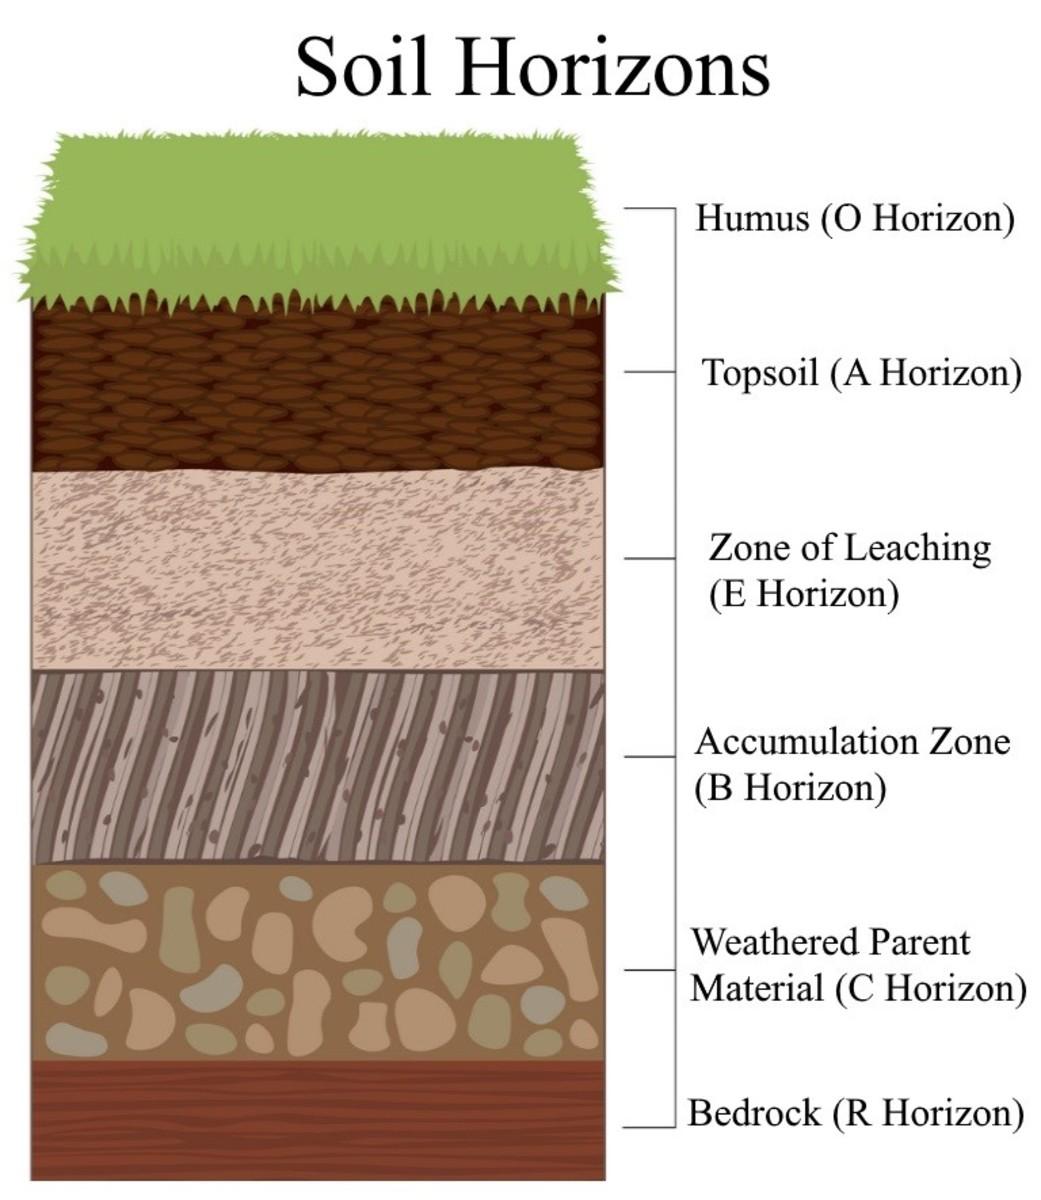 visual-manual-soil-classification-for-cmt-field-technicians